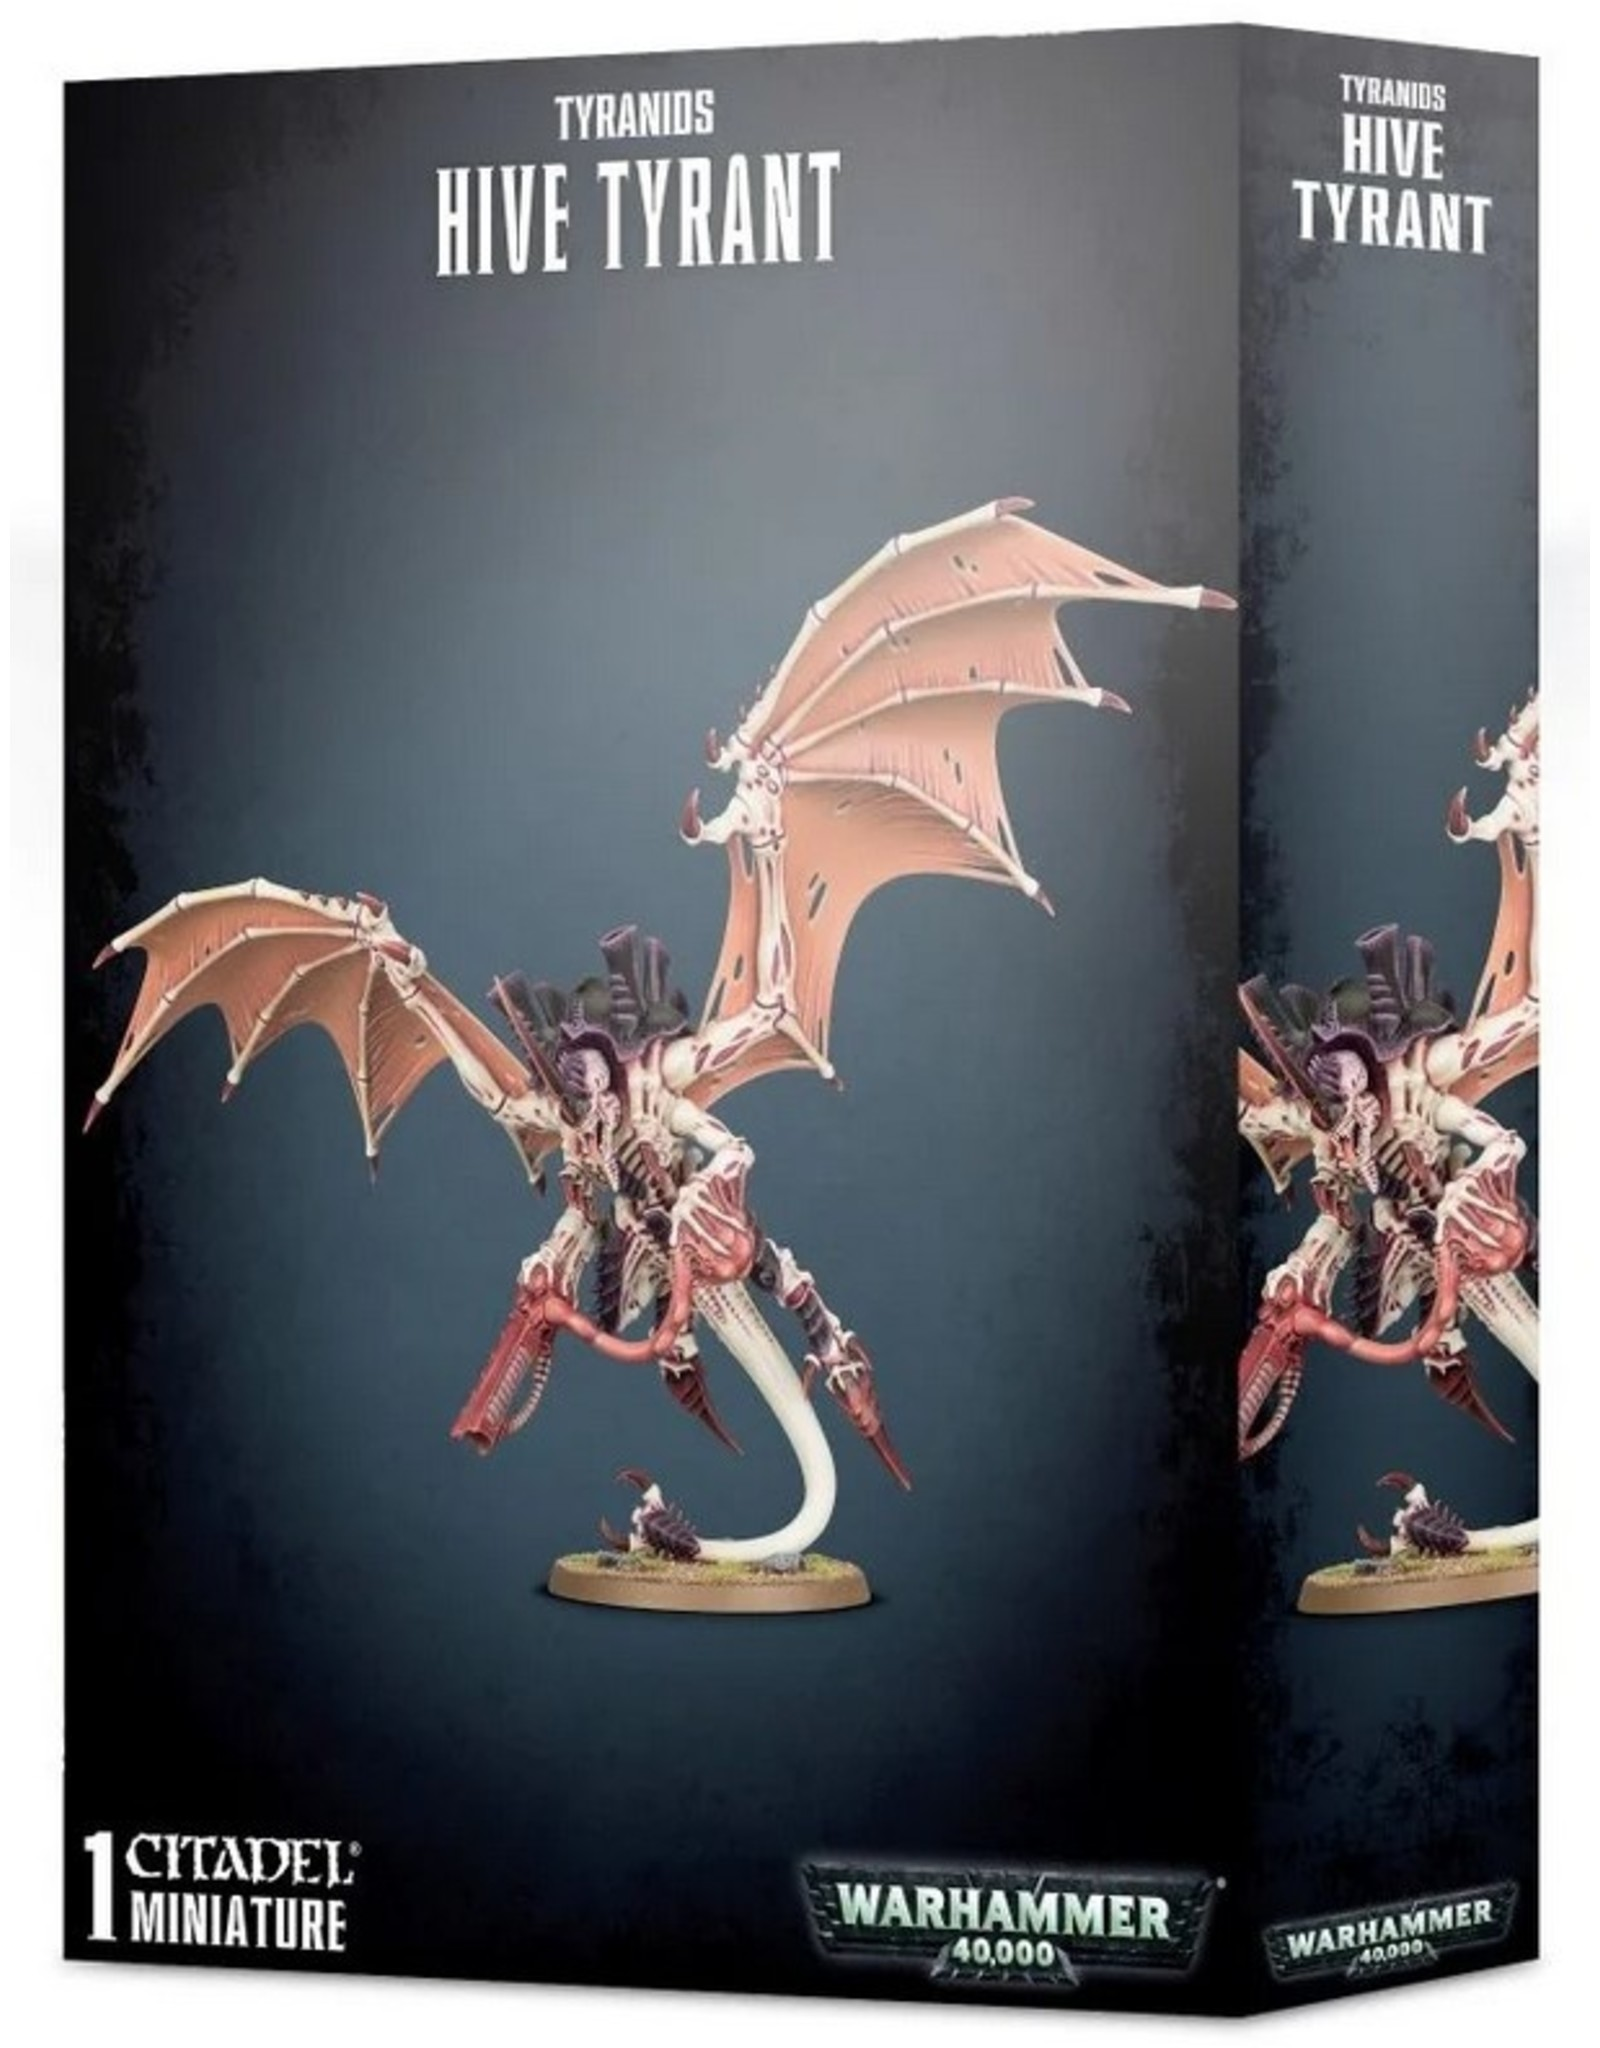 Warhammer 40K WH40K Tyranids Hive Tyrant